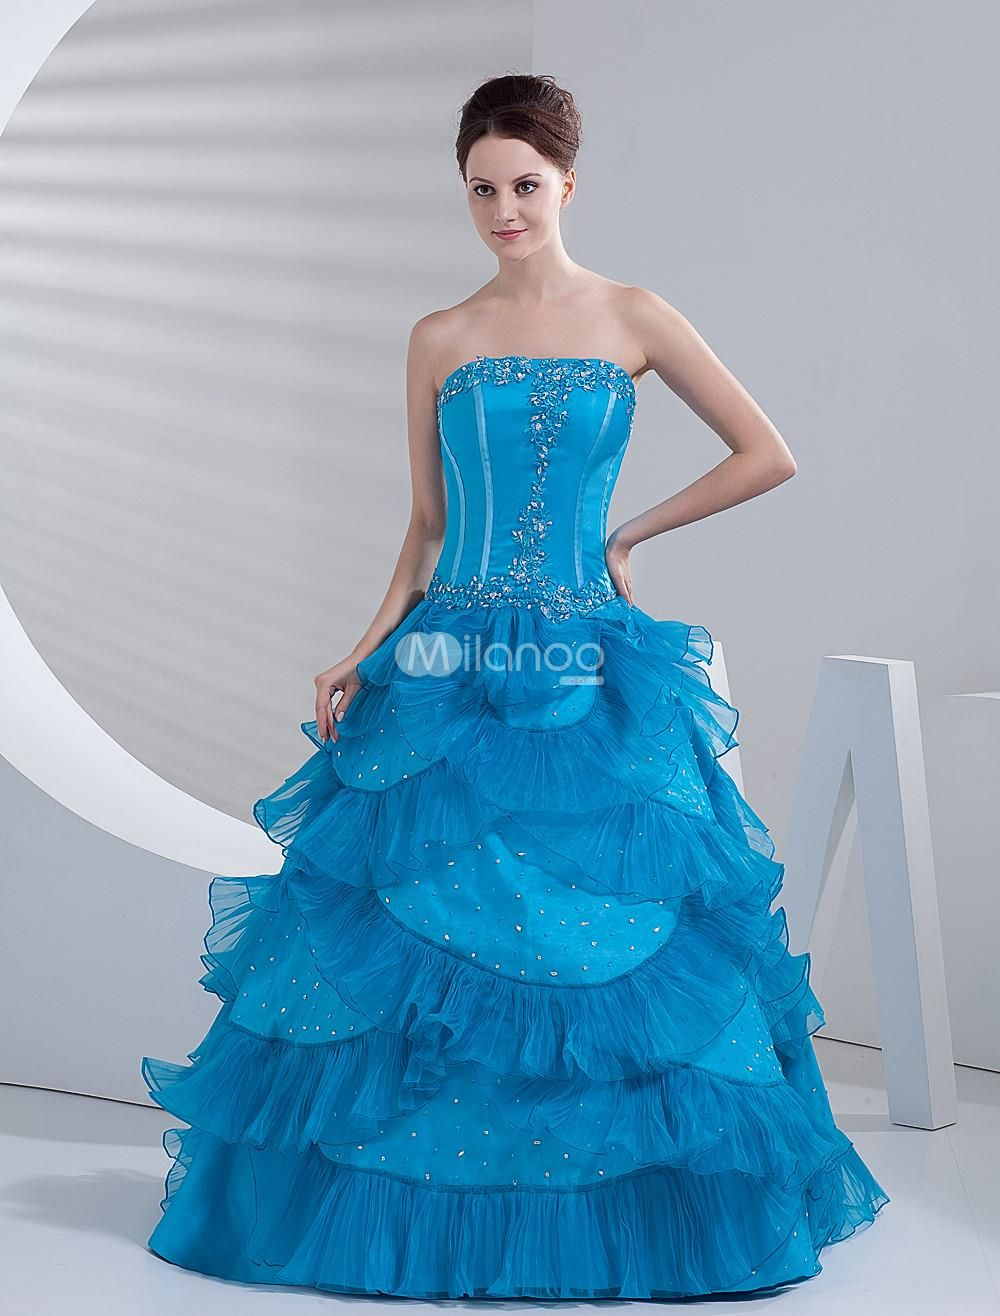 Blue satin organza beautiful women prom dress strapless dresses are